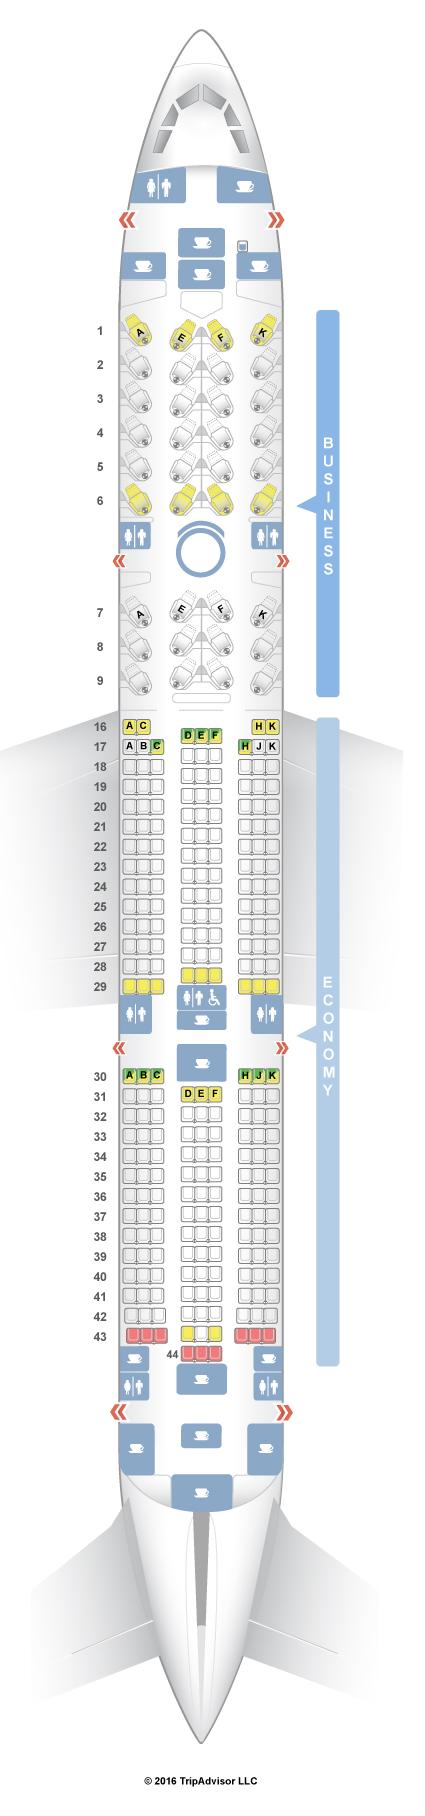 Seatguru Seat Map Qatar Airways Airbus A350 350